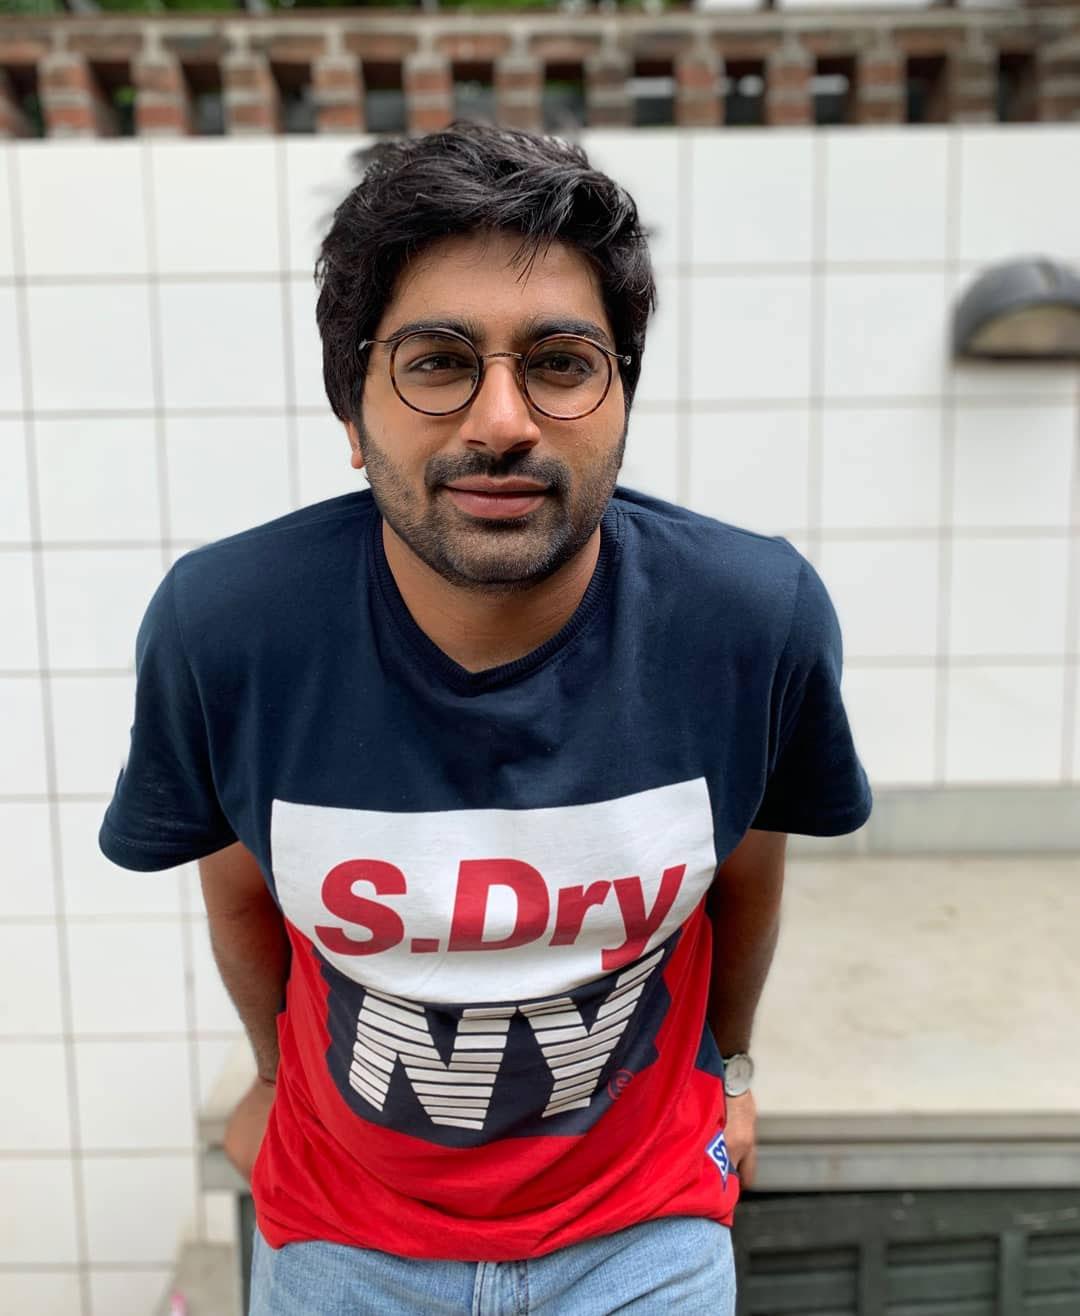 जन्मदिवस विशेष : गुजराती सिनेमा का ध्रुव तारा 'मल्हार ठाकर'